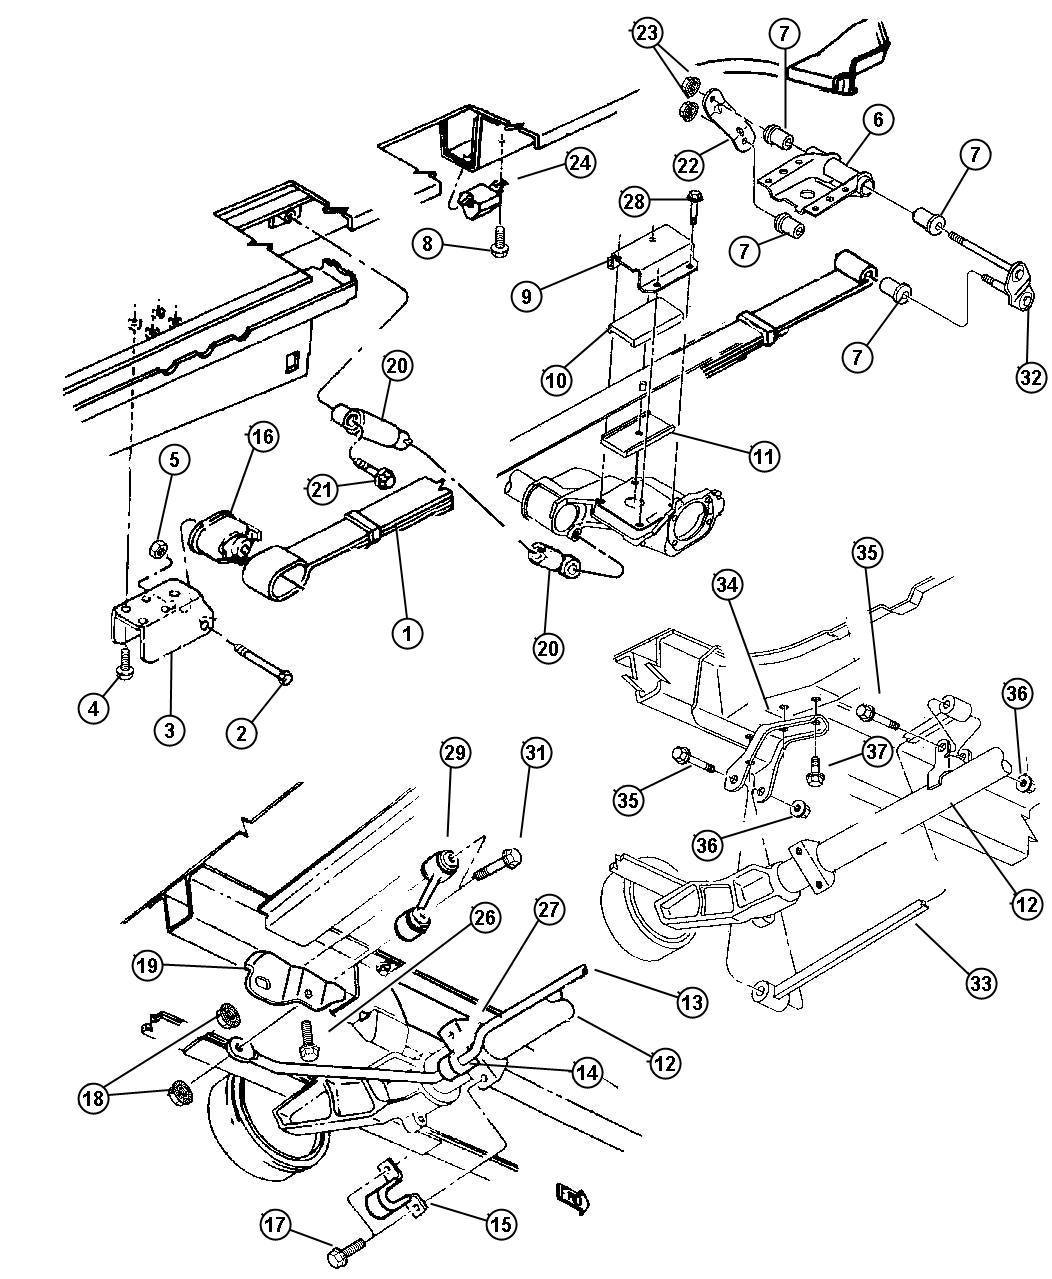 04743630ab dodge axle rear suspension sda sdb for Suspension sdb